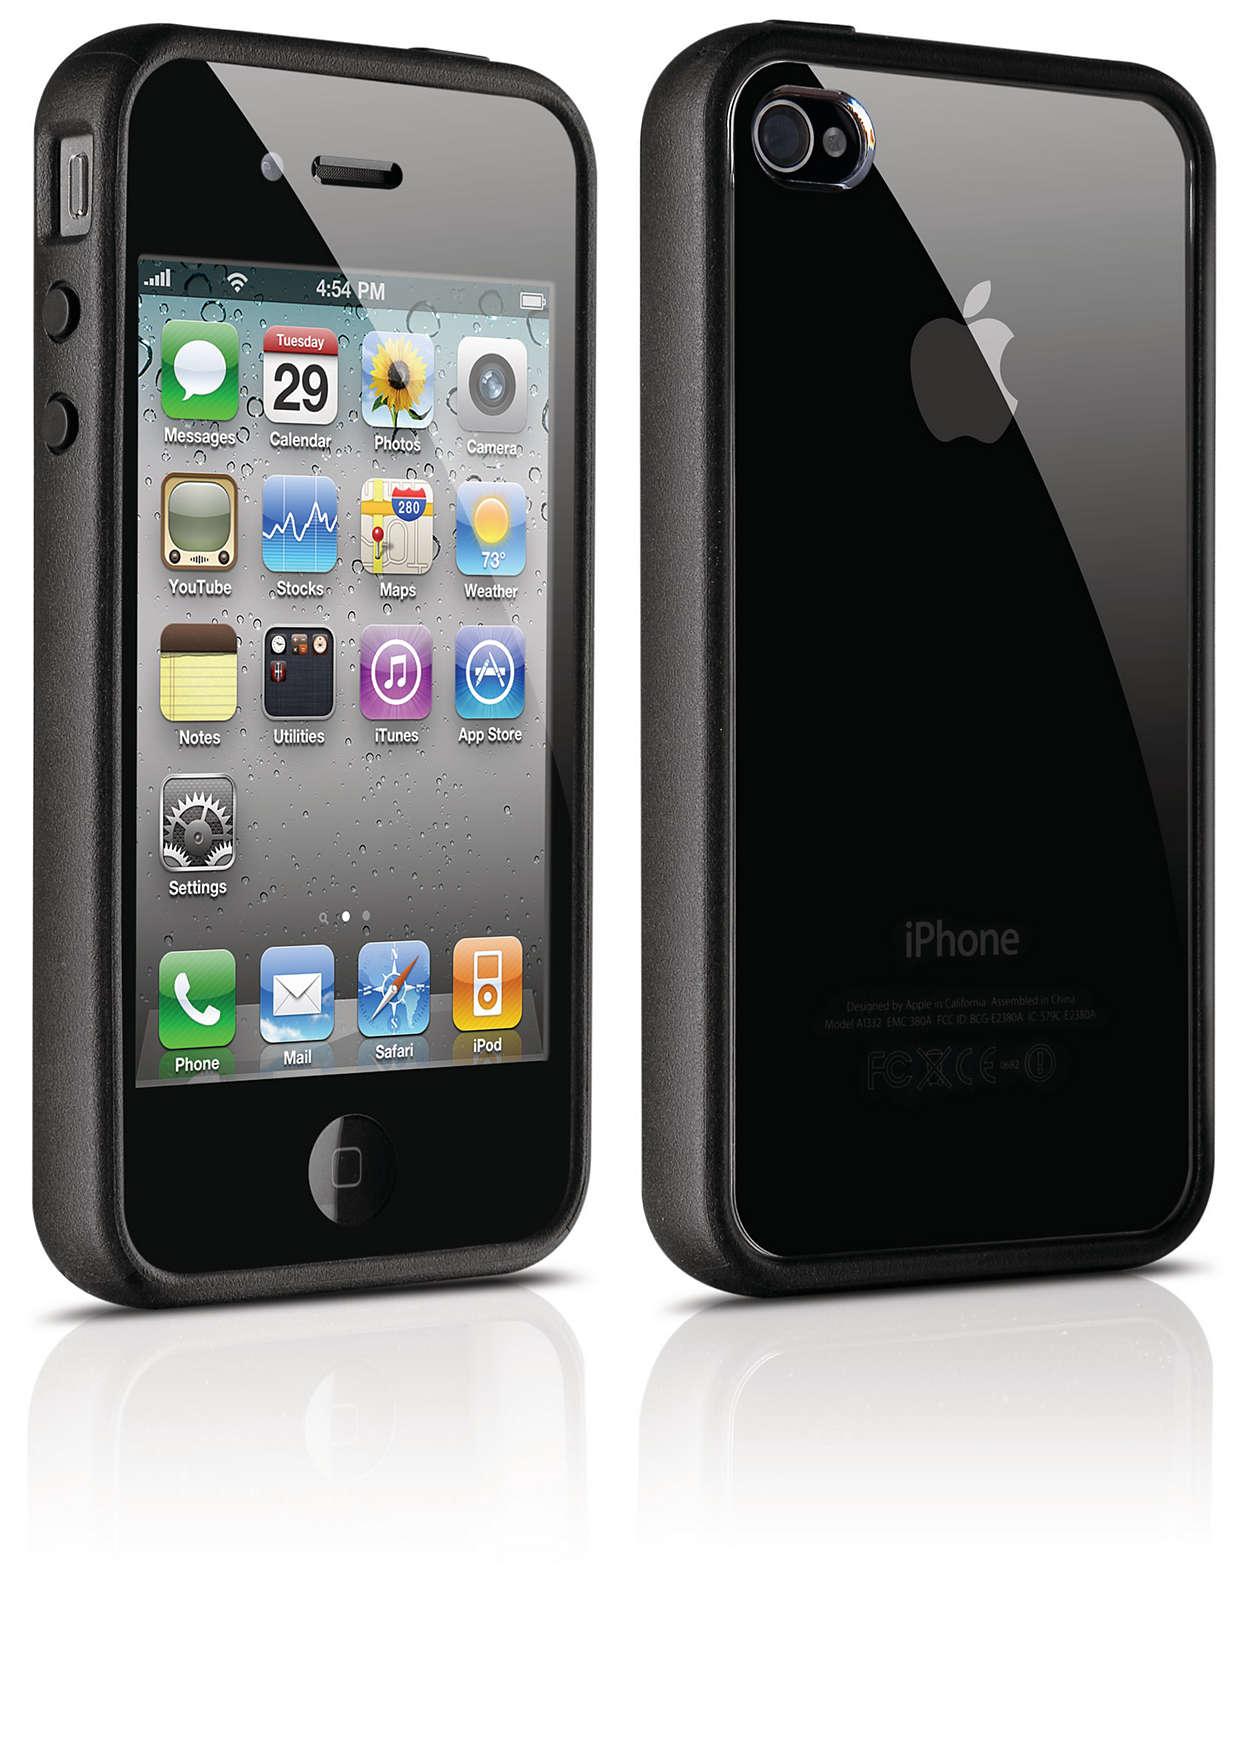 Beskytt iPhone i et hardt etui